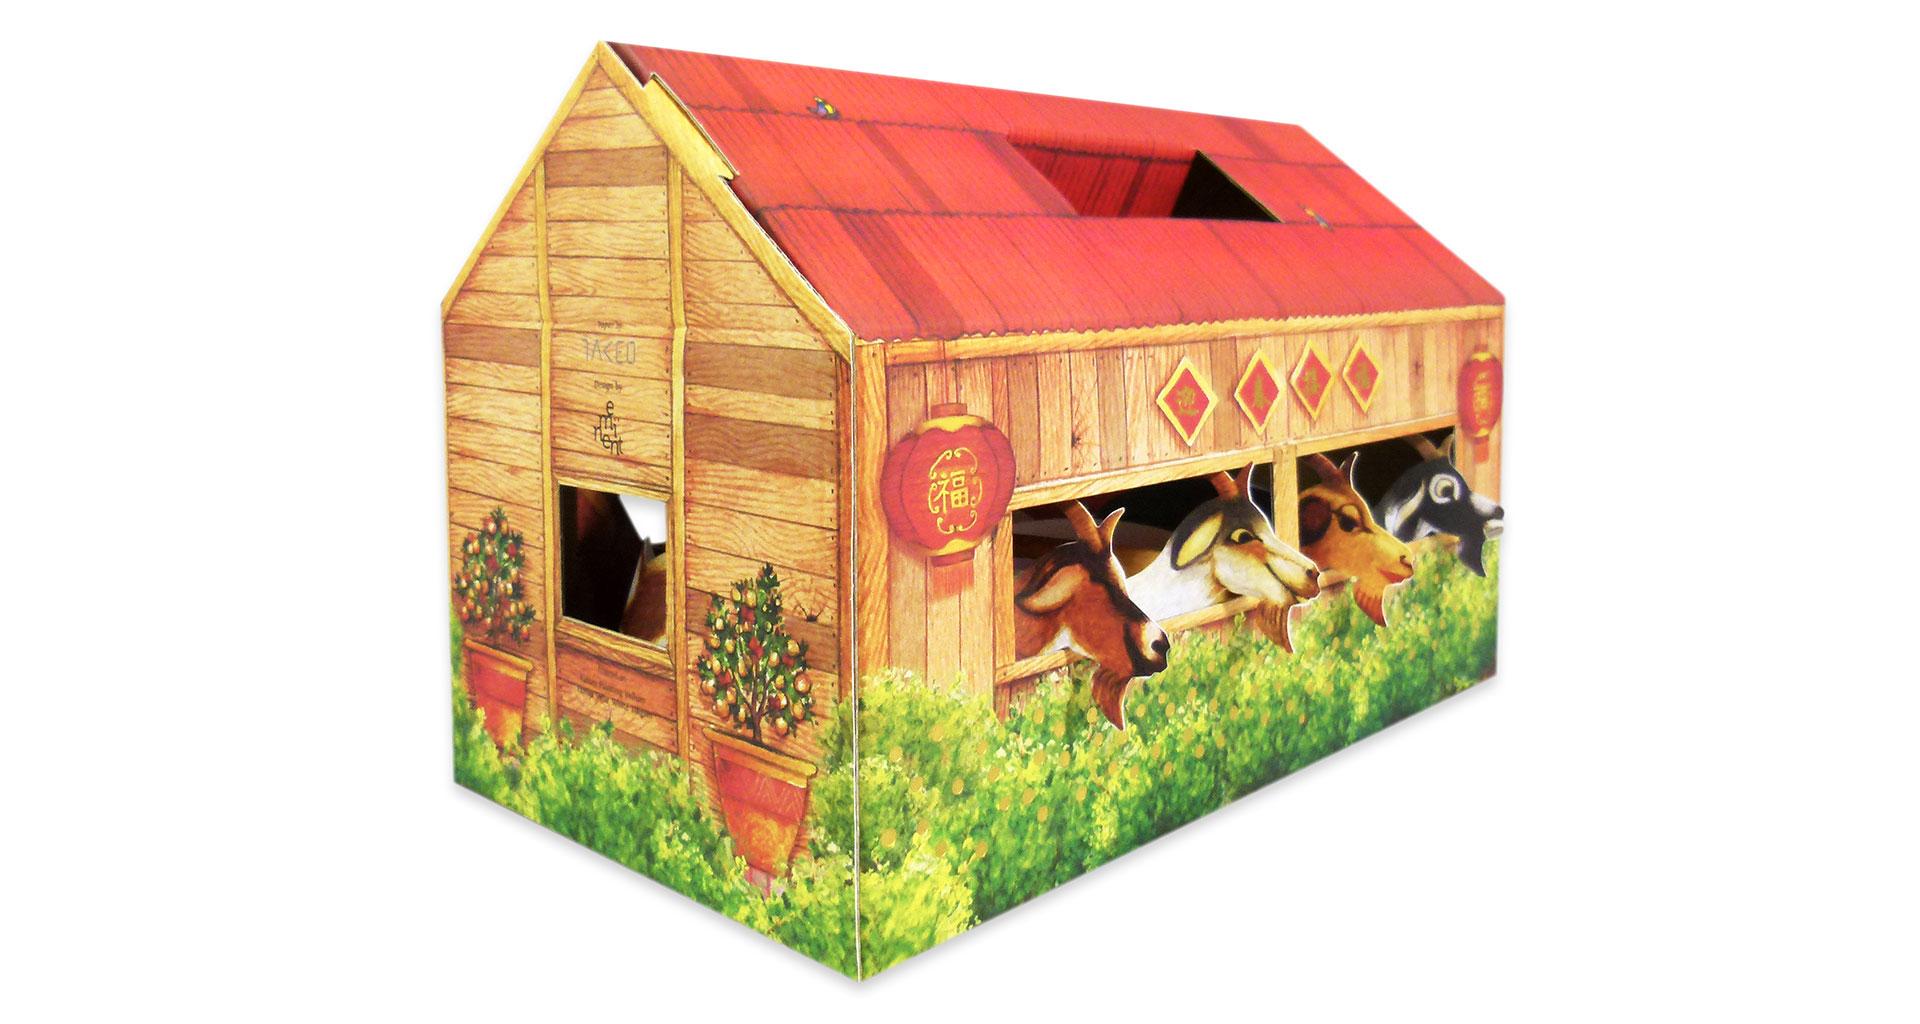 879-goat-barn-1